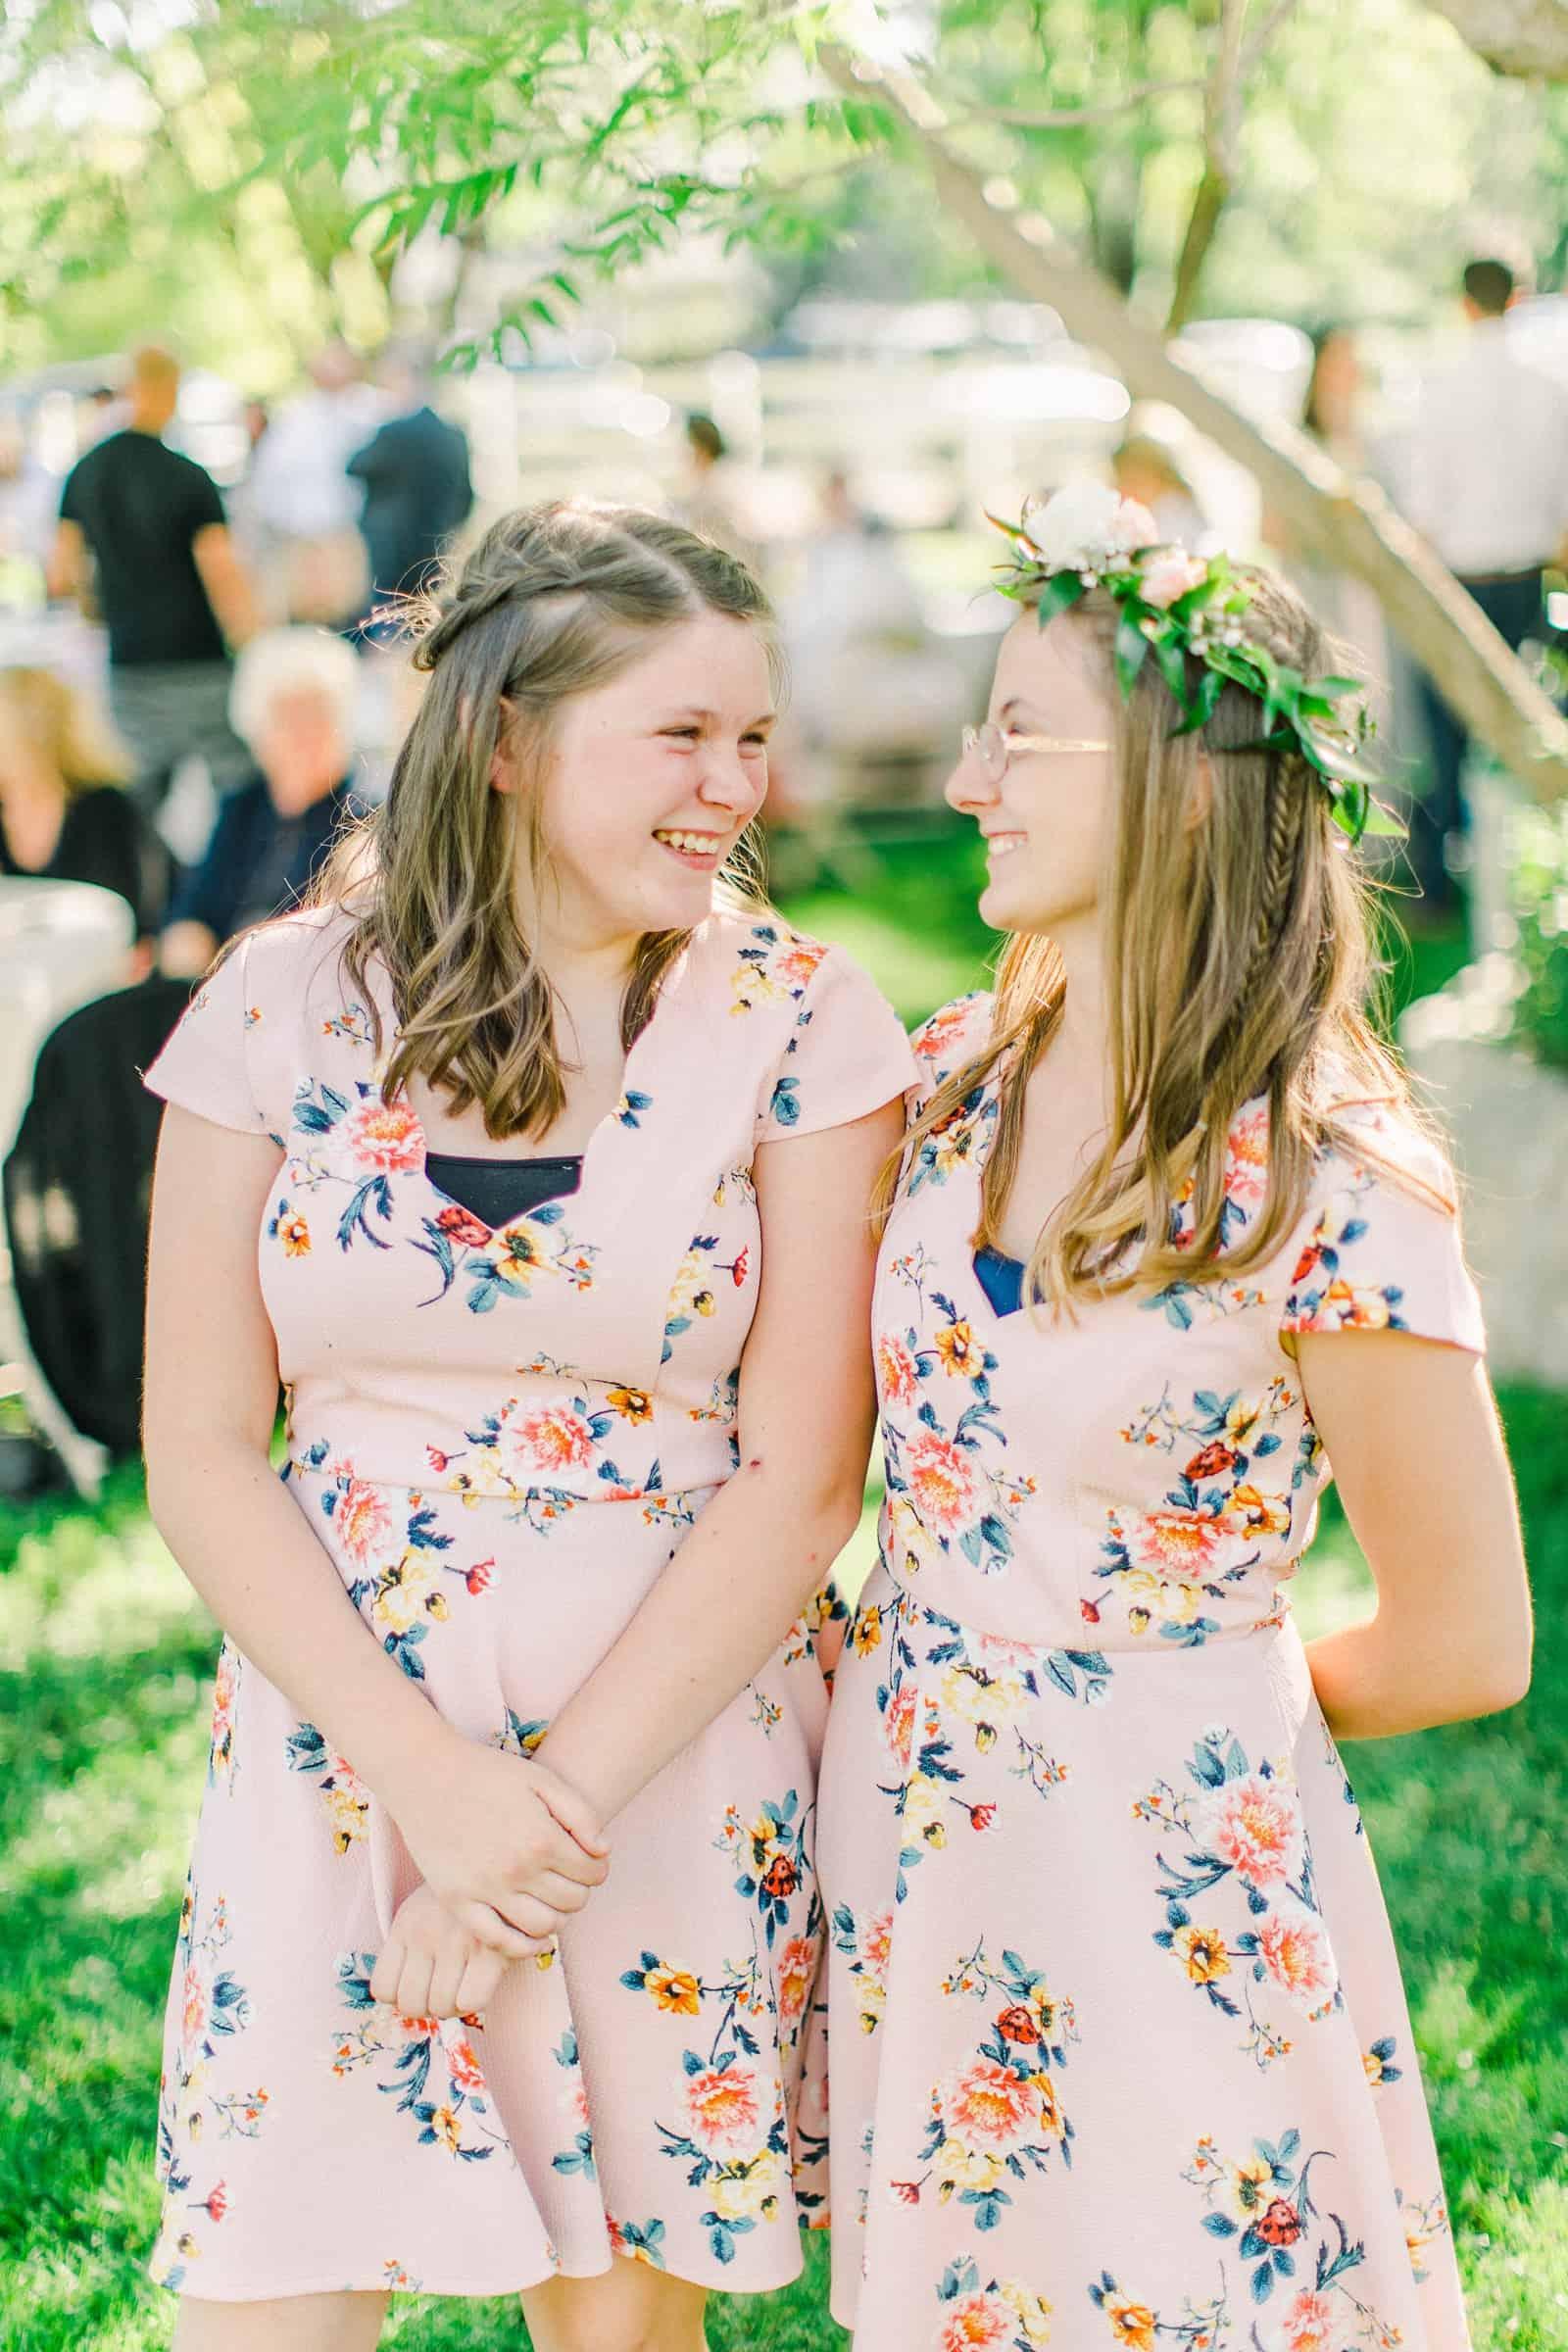 Draper LDS Temple Wedding, Utah wedding photography, summer backyard wedding, flower girl greenery crown